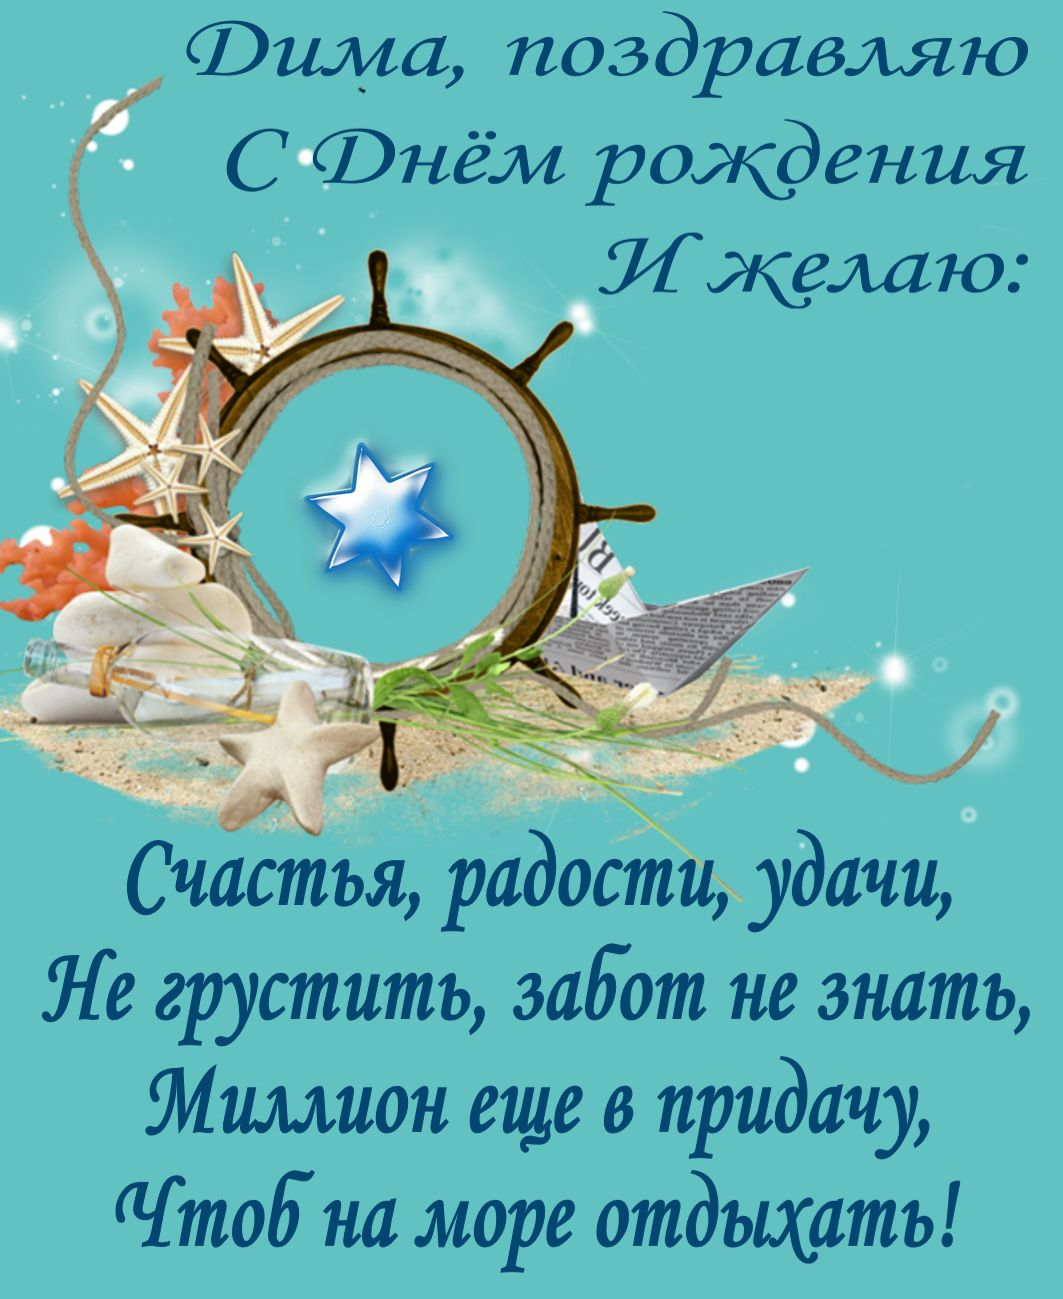 Открытка на морскую тематику для Димы